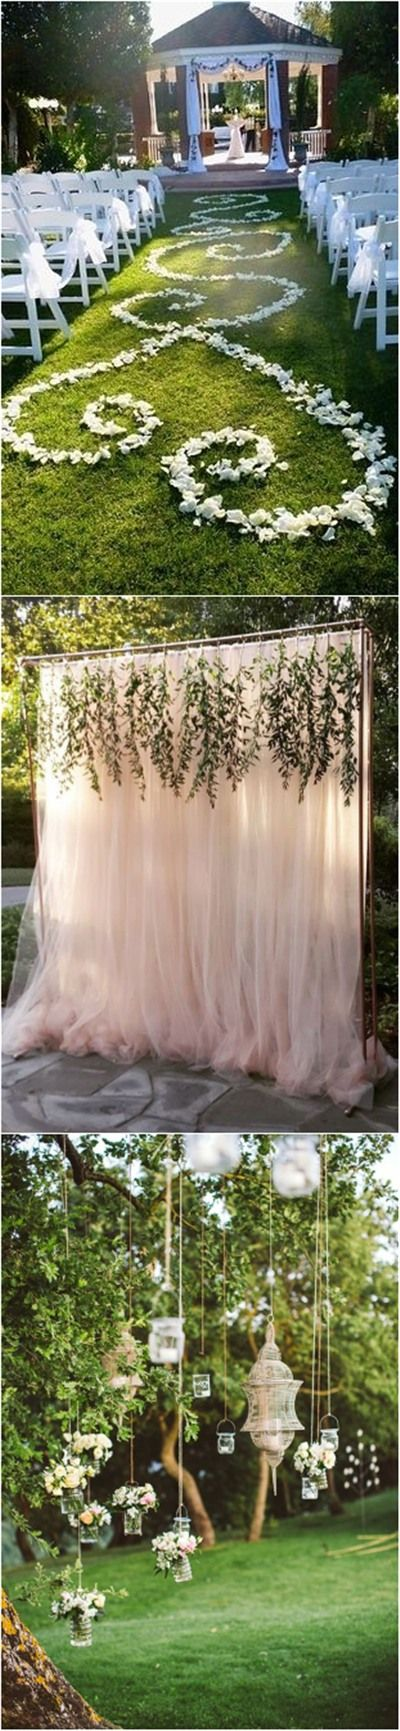 Outdoor Wedding decorations   http://www.weddinginclude.com/2016/11/genius-outdoor-wedding-ideas/